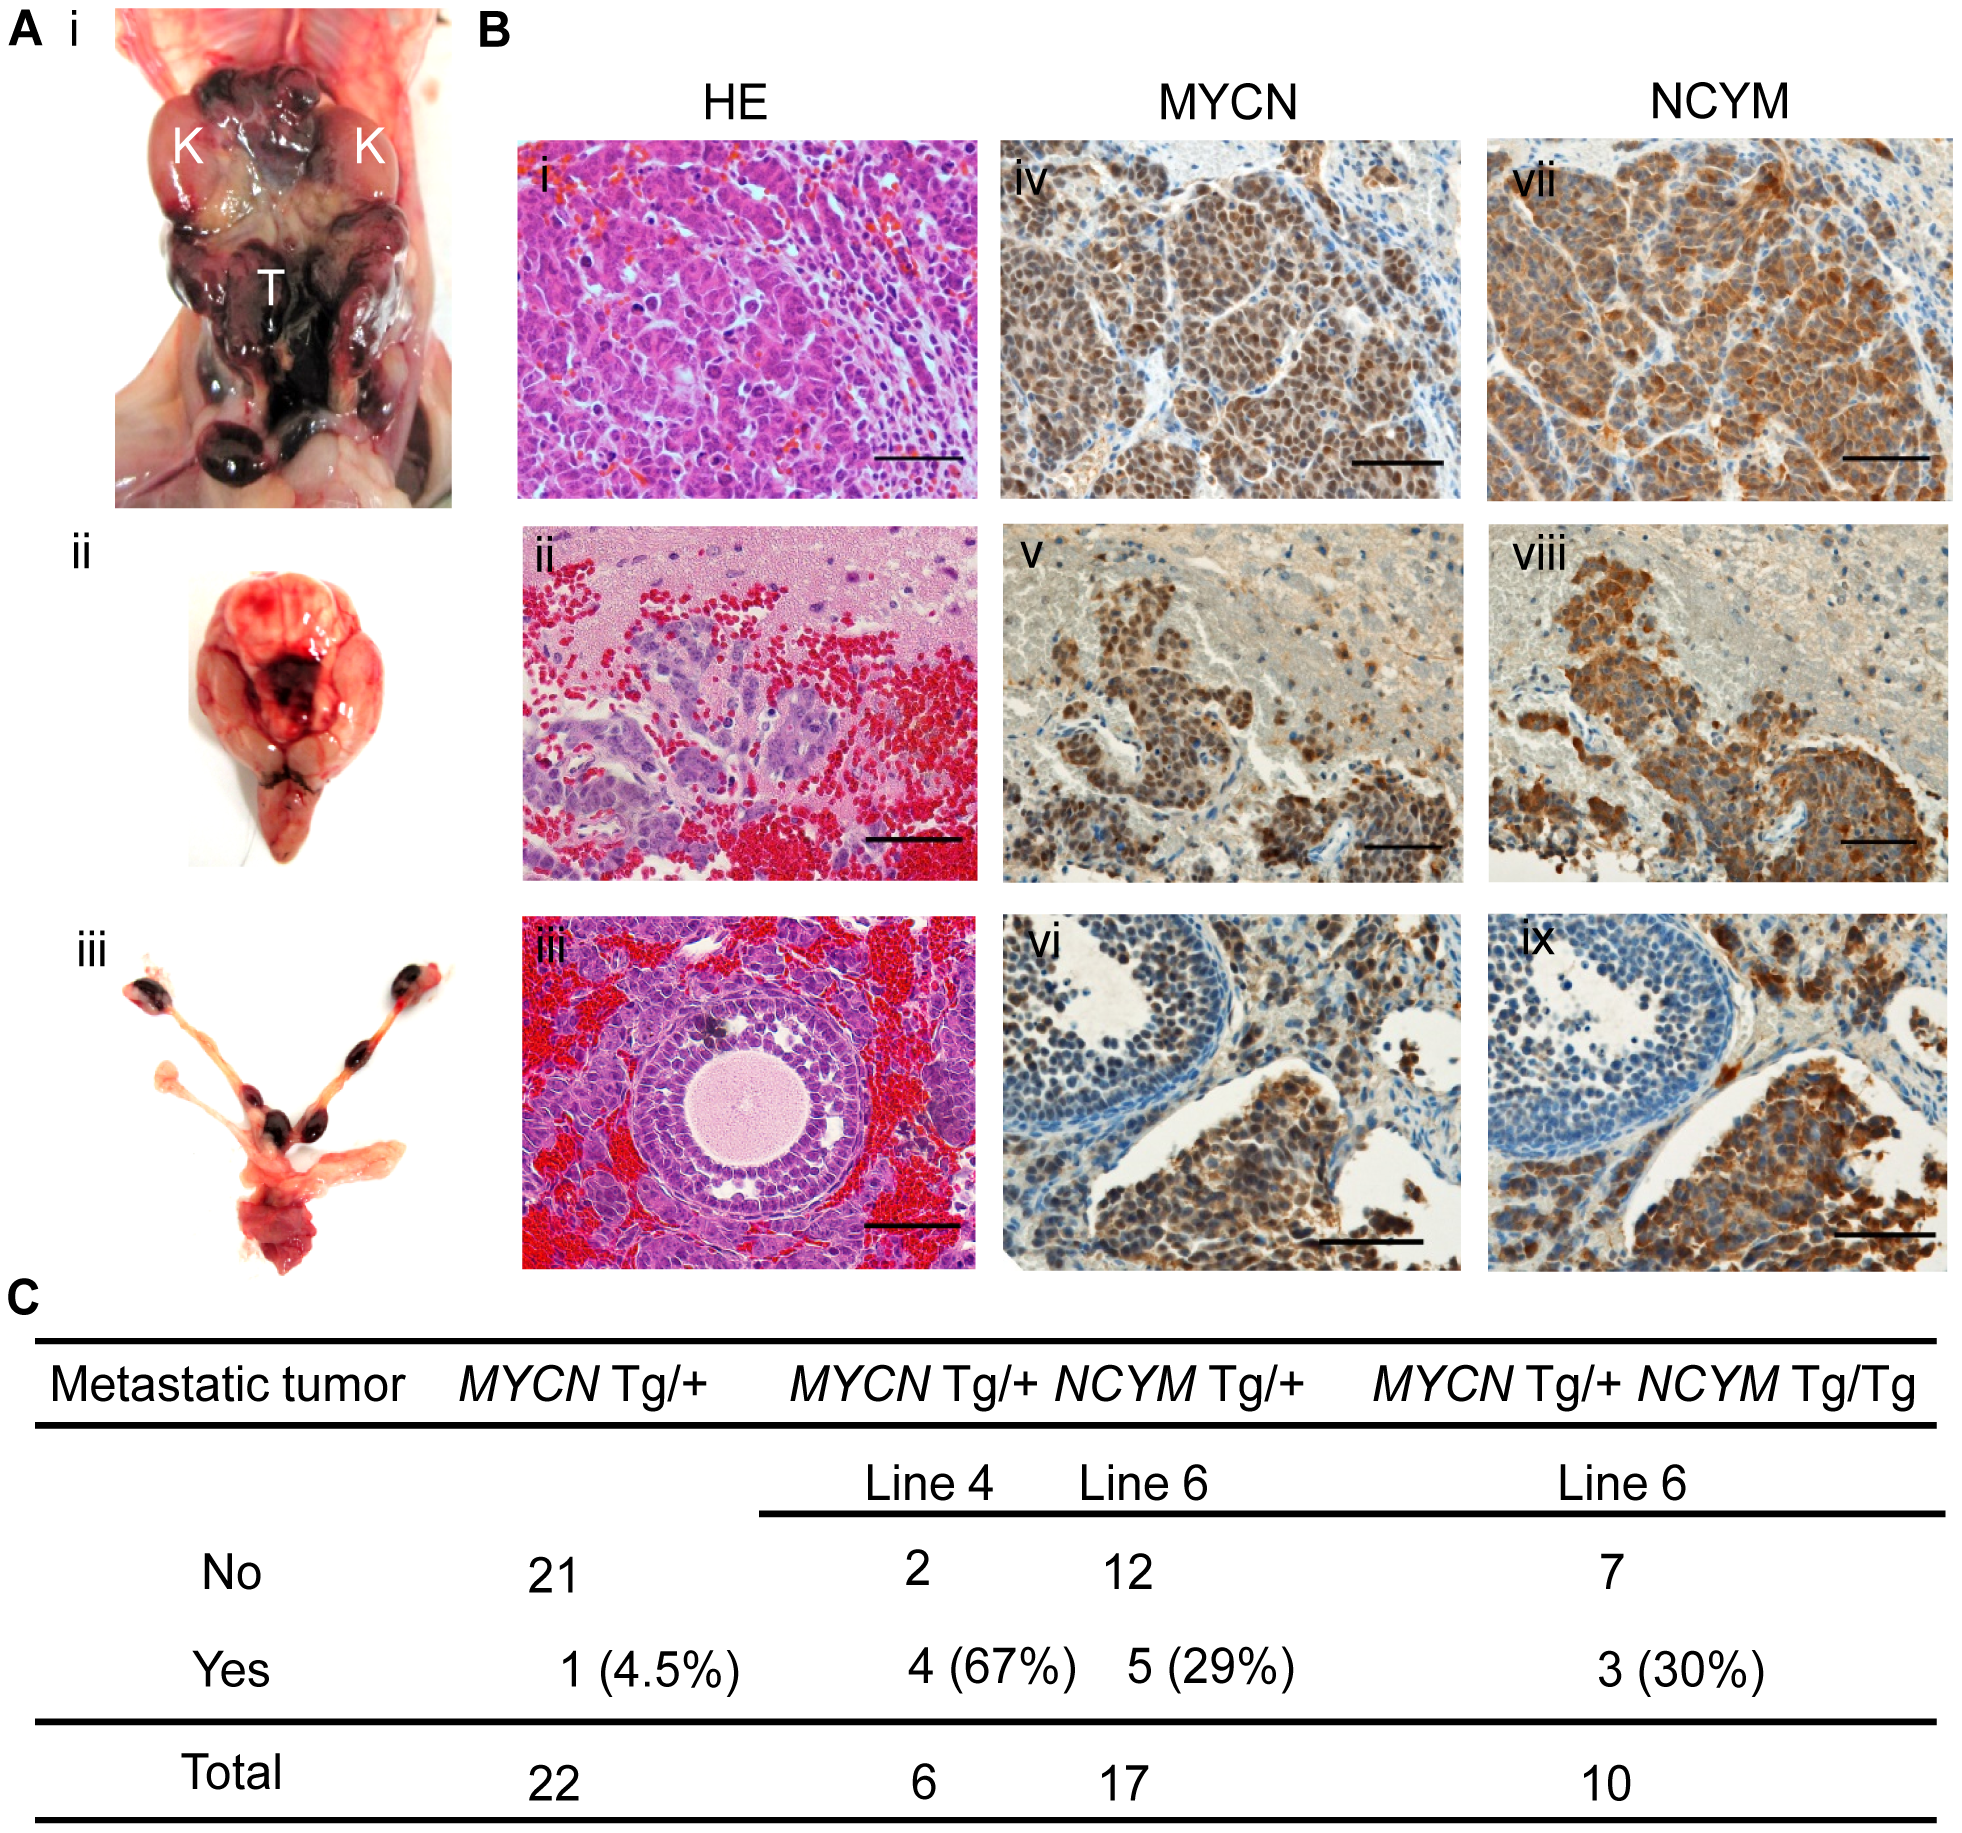 NCYM promotes metastasis in mouse transgenic models of neuroblastoma.